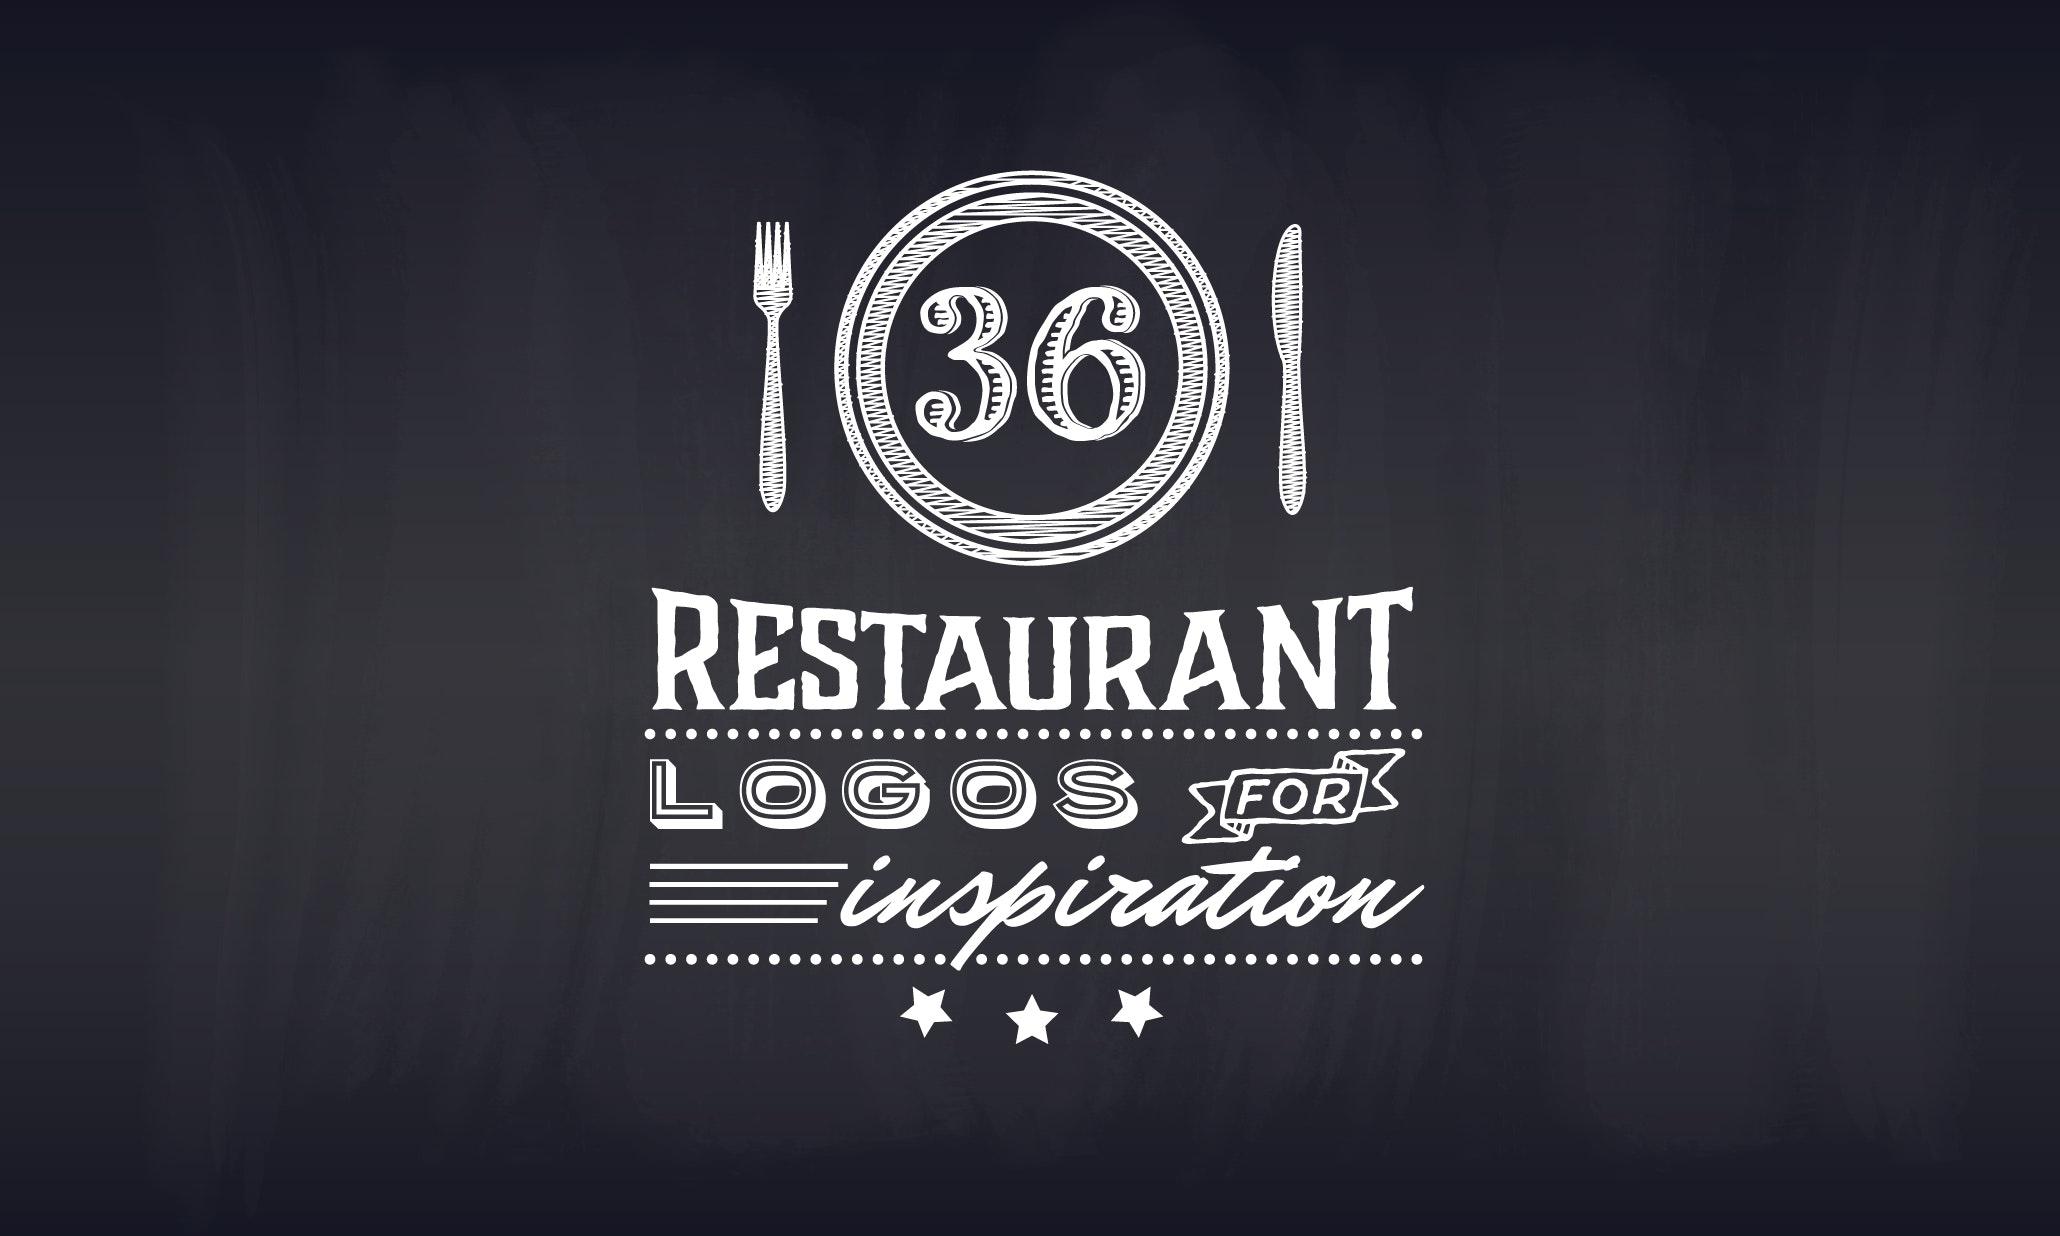 36 of the best restaurant logos for inspiration 99designs rh 99designs com